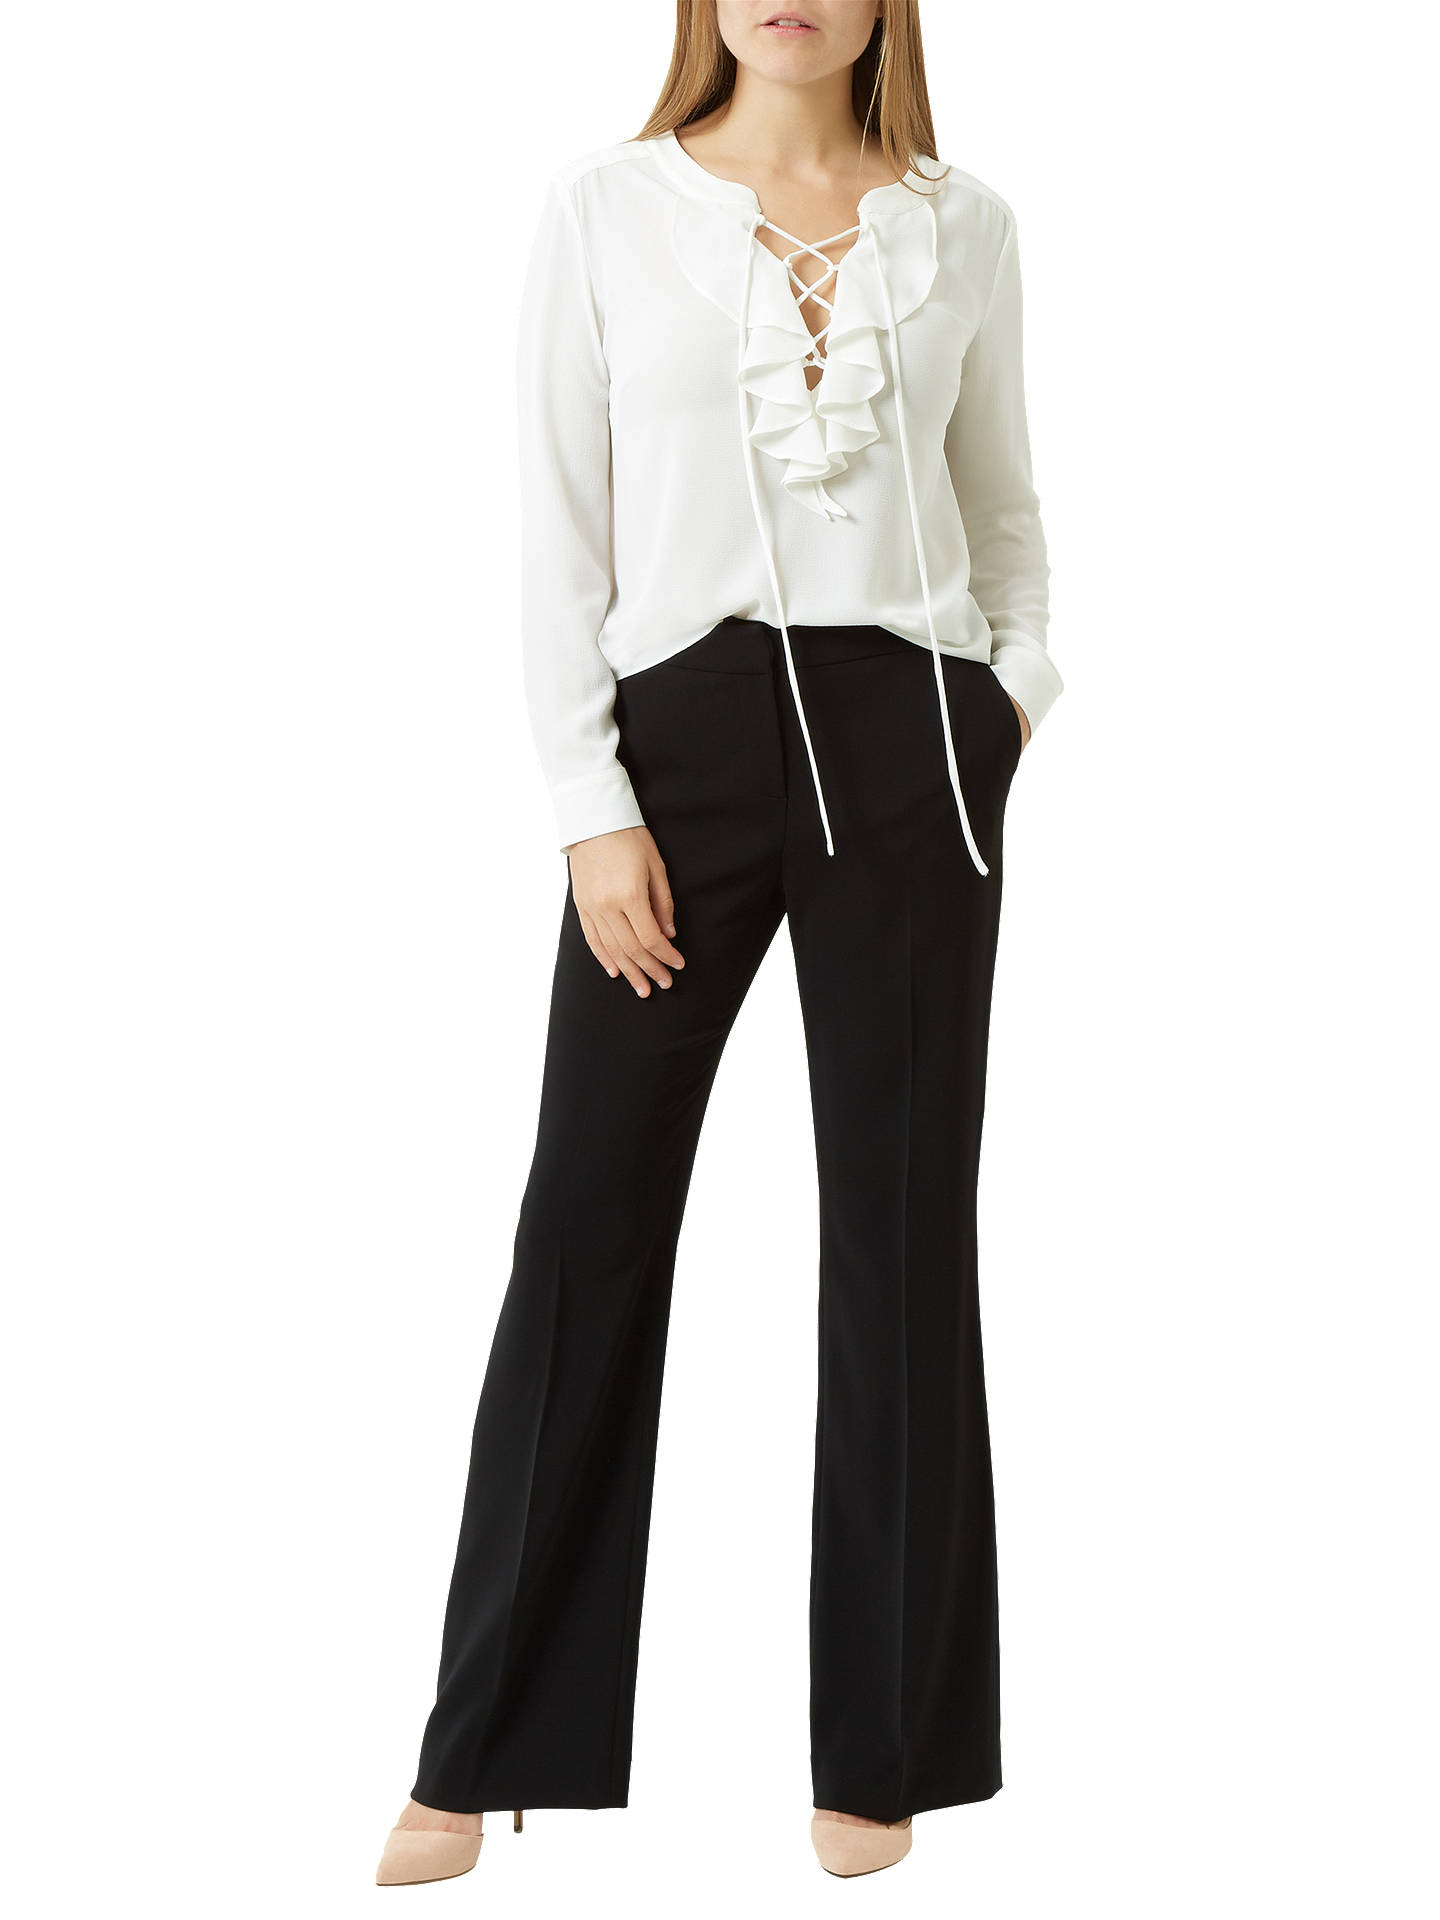 3a903d6dc3a2 ... Buy Fenn Wright Manson Petite Harper Trouser, Black, 8 Online at  johnlewis.com ...